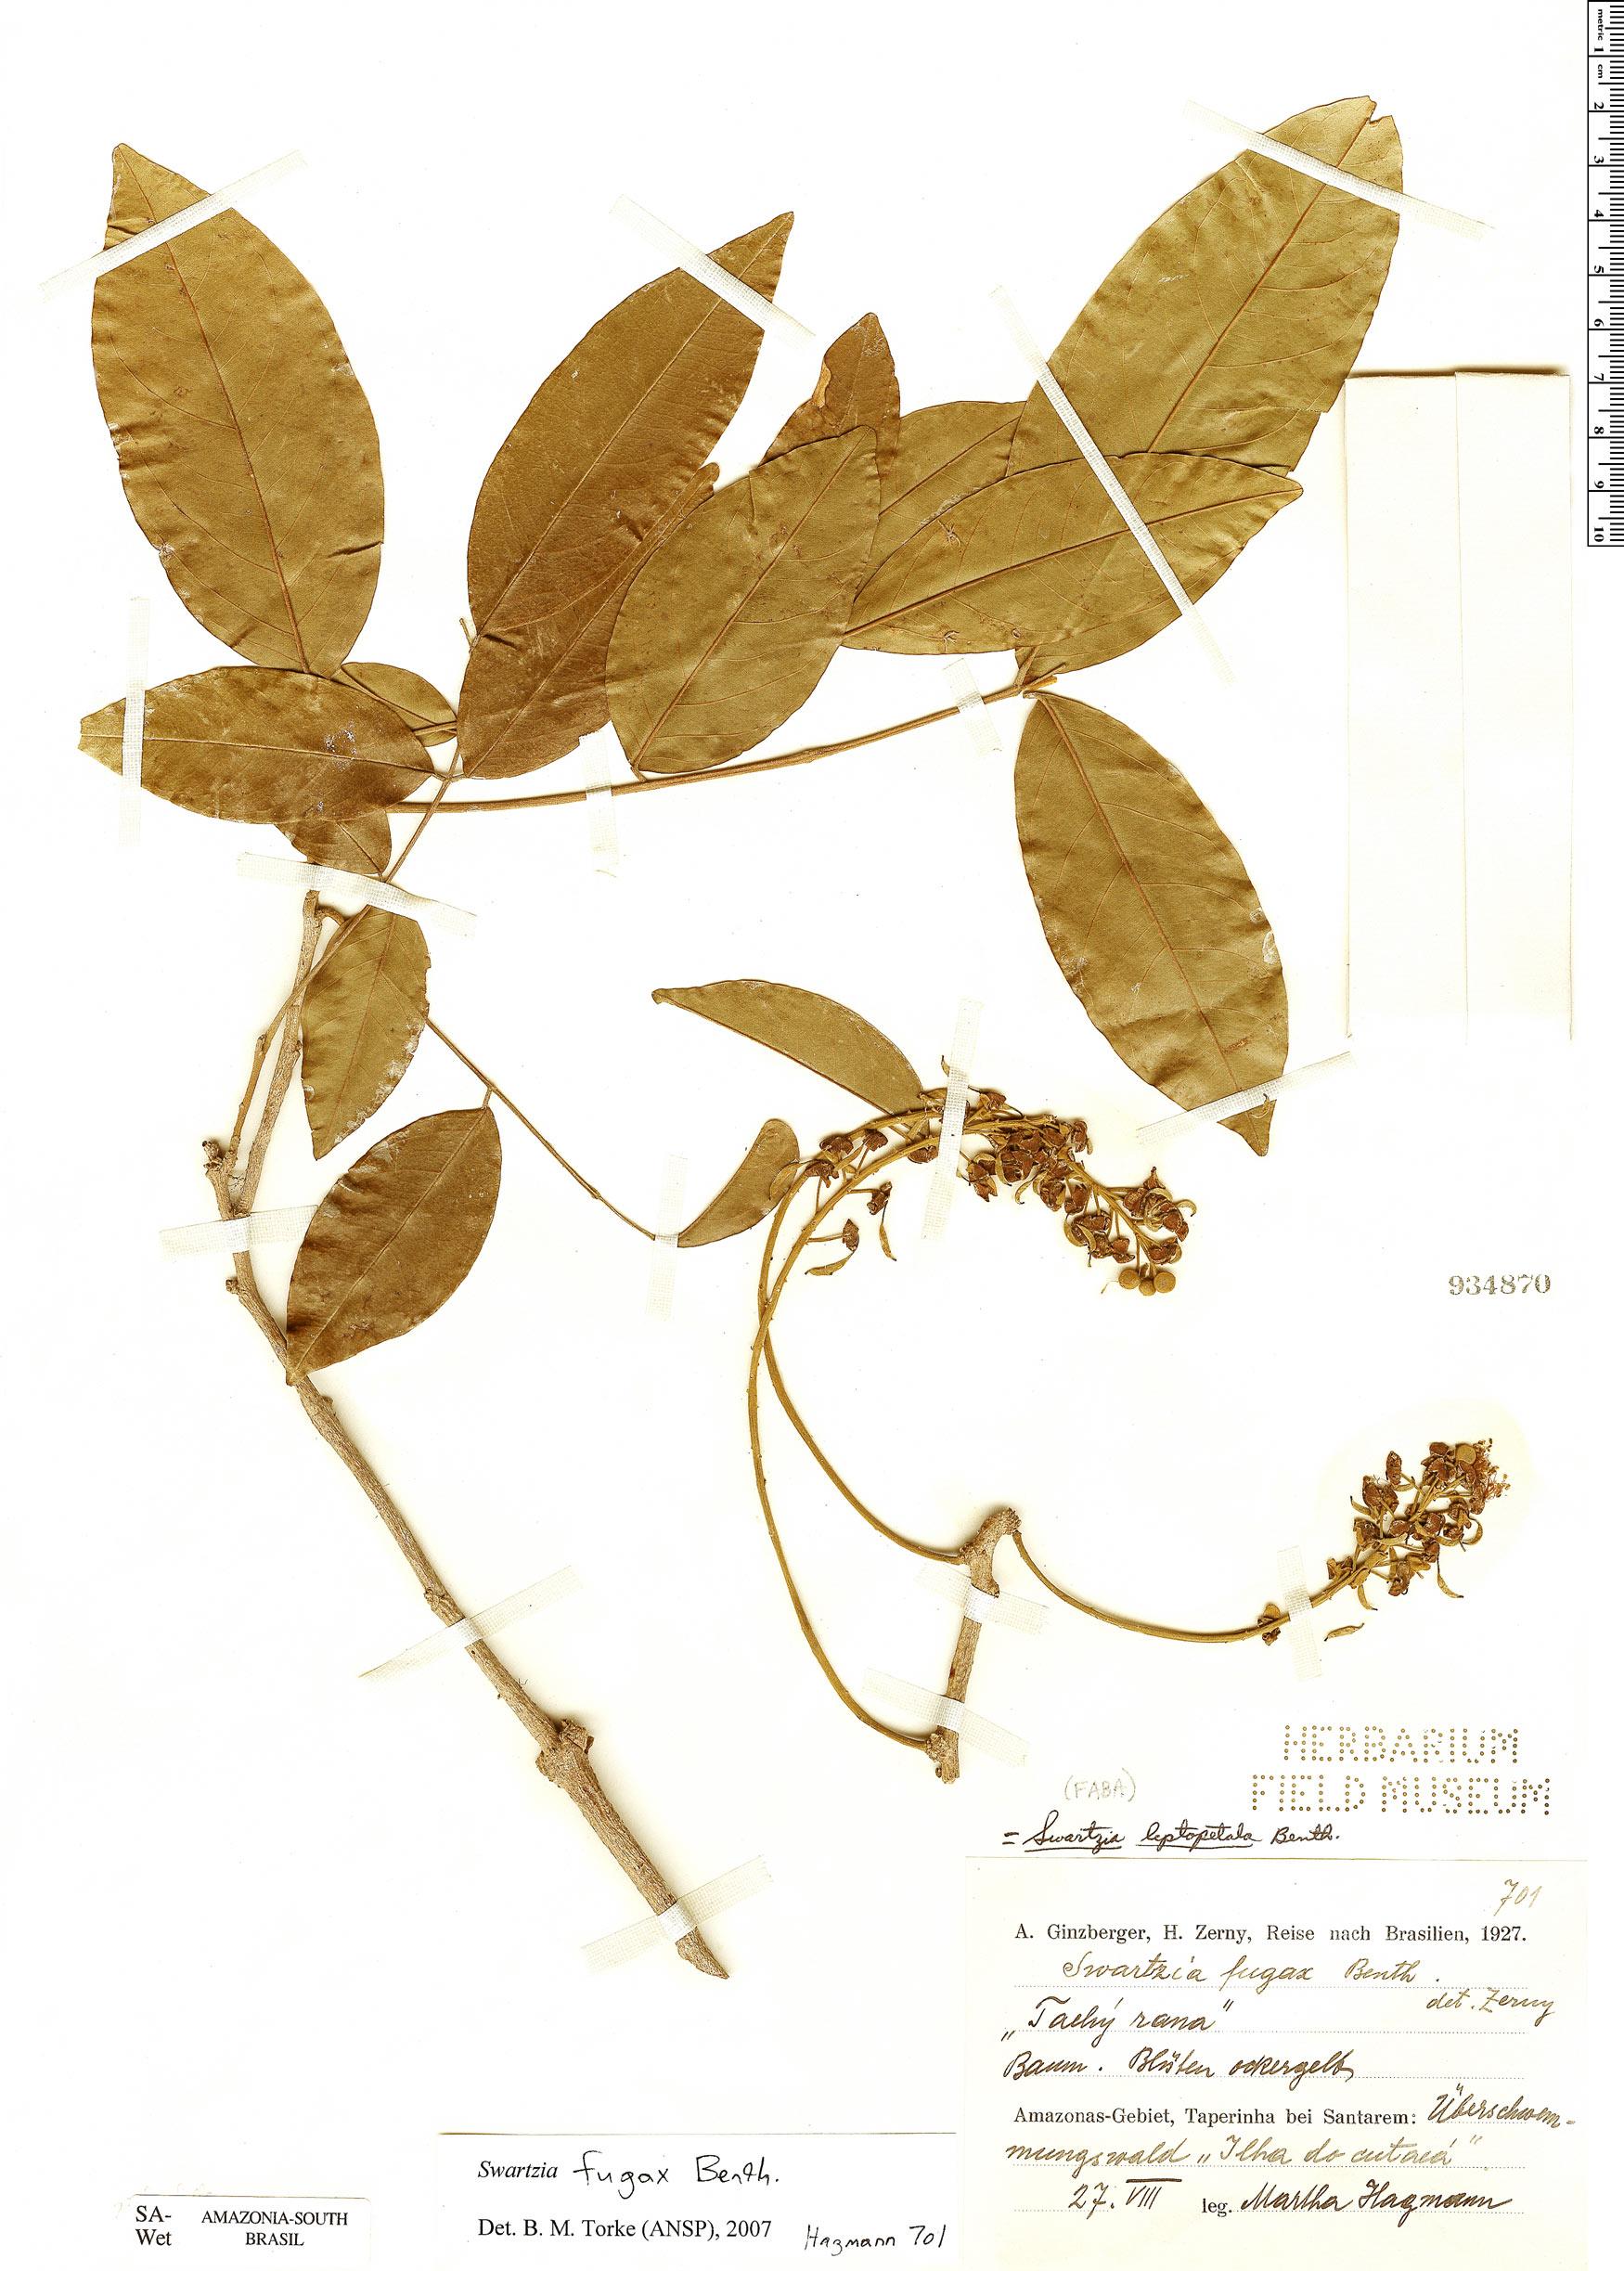 Espécime: Swartzia fugax